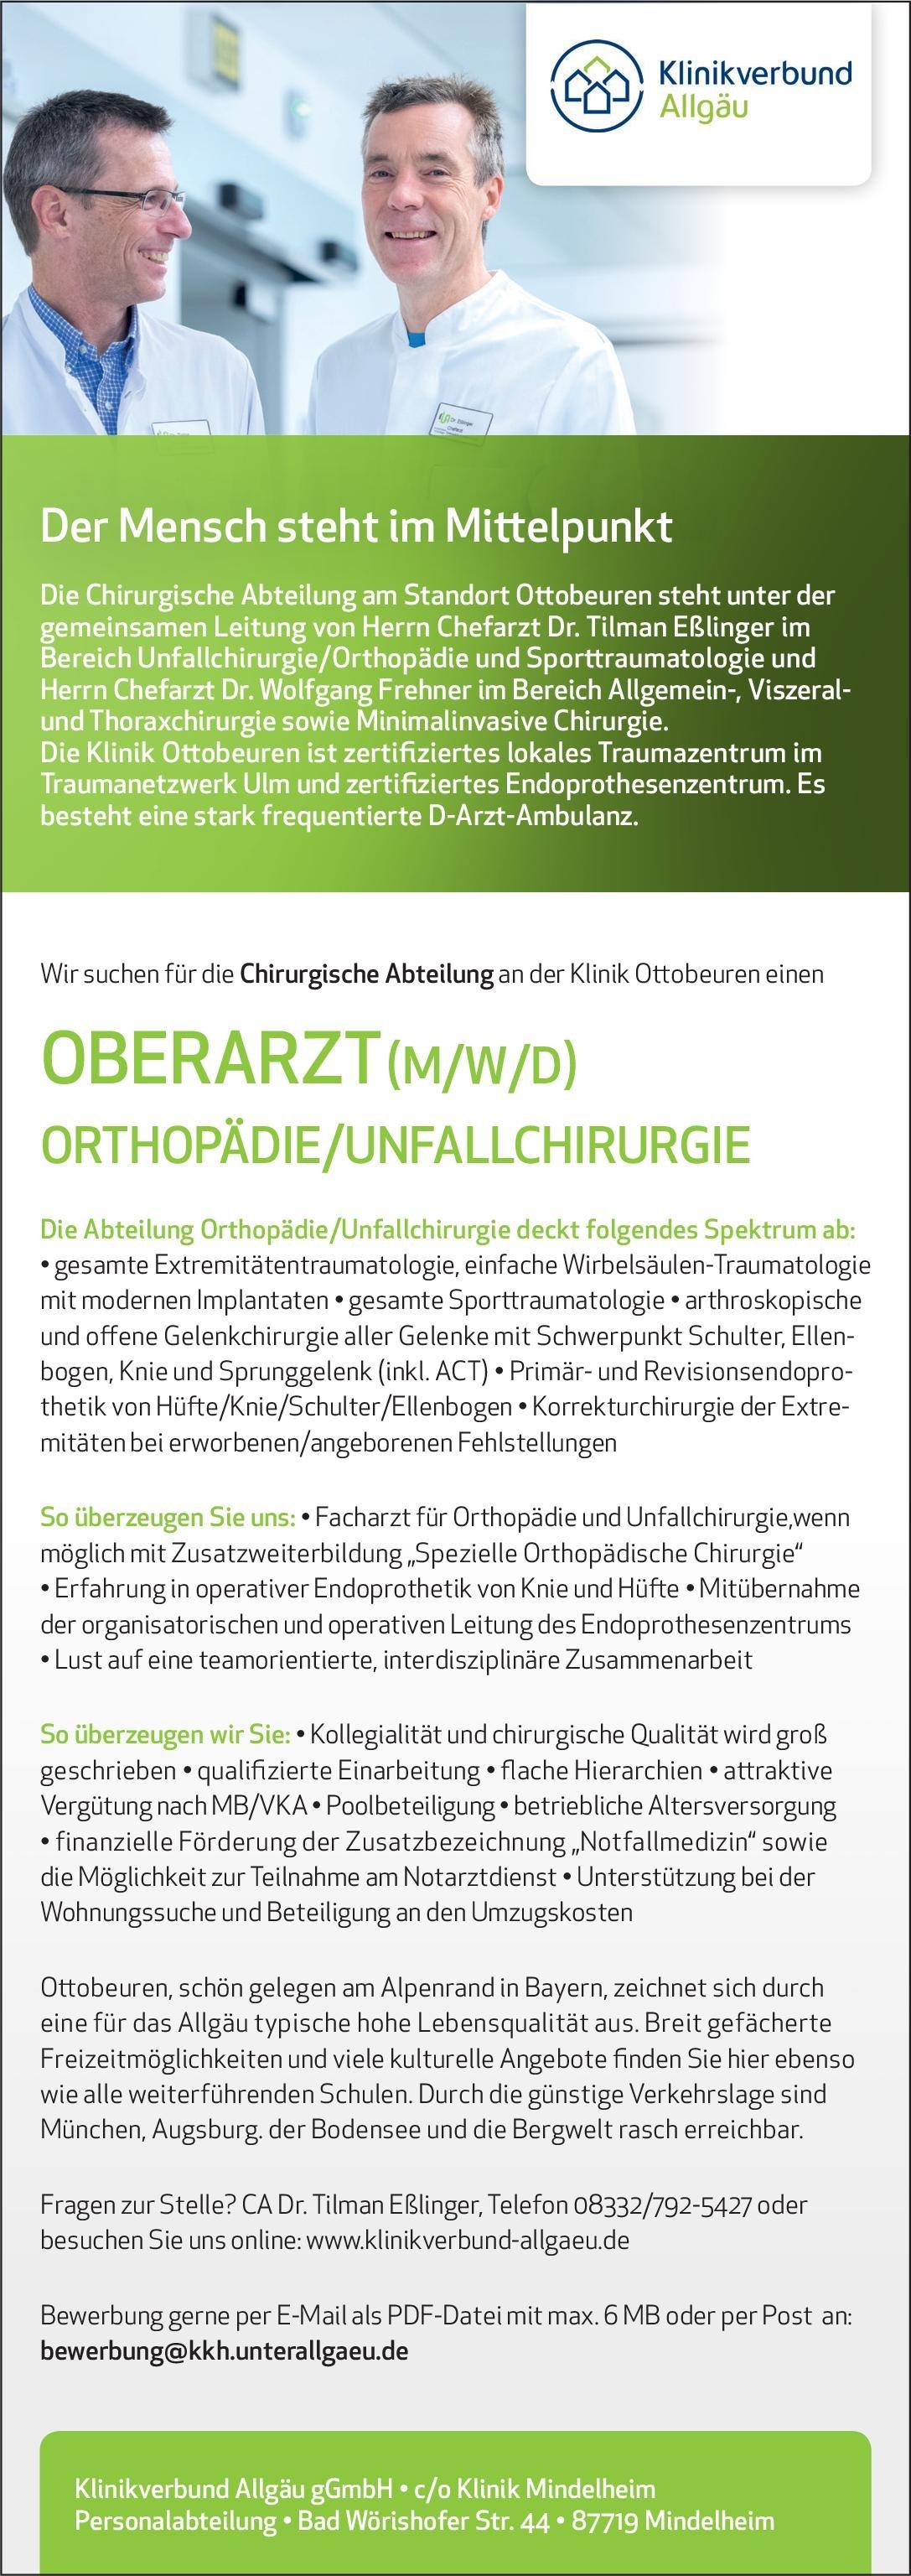 Klinikverbund Allgäu gGmbH - Klinik Ottobeuren Oberarzt (m/w/d) Orthopädie/Unfallchirurgie  Orthopädie und Unfallchirurgie, Chirurgie Oberarzt